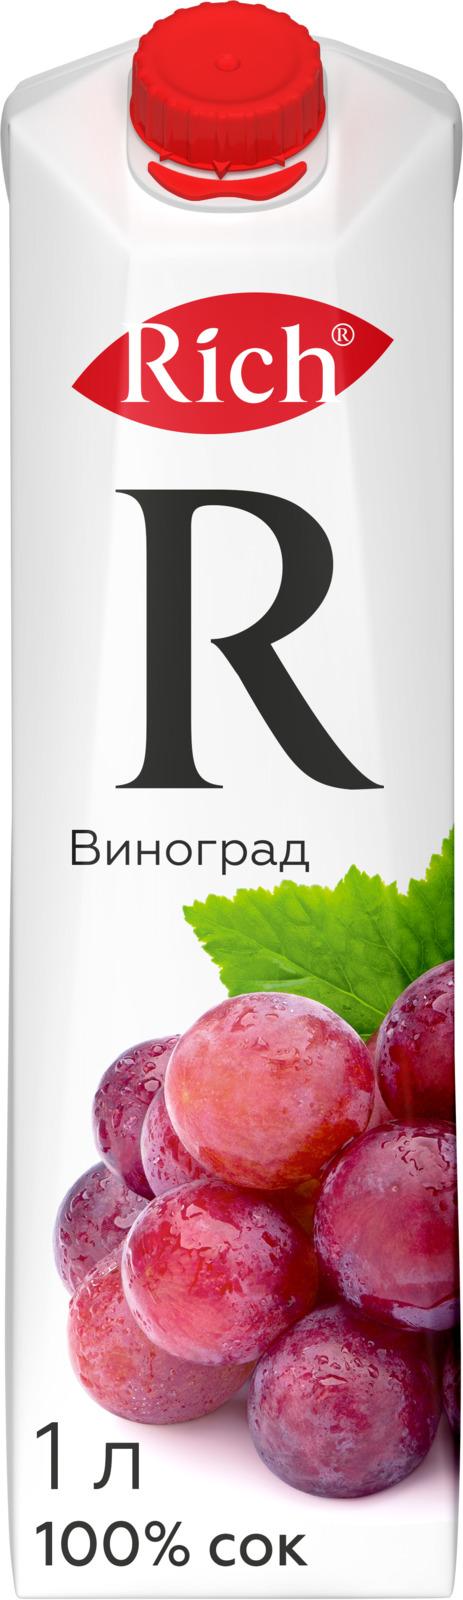 Rich Виноградный сок, 1 л